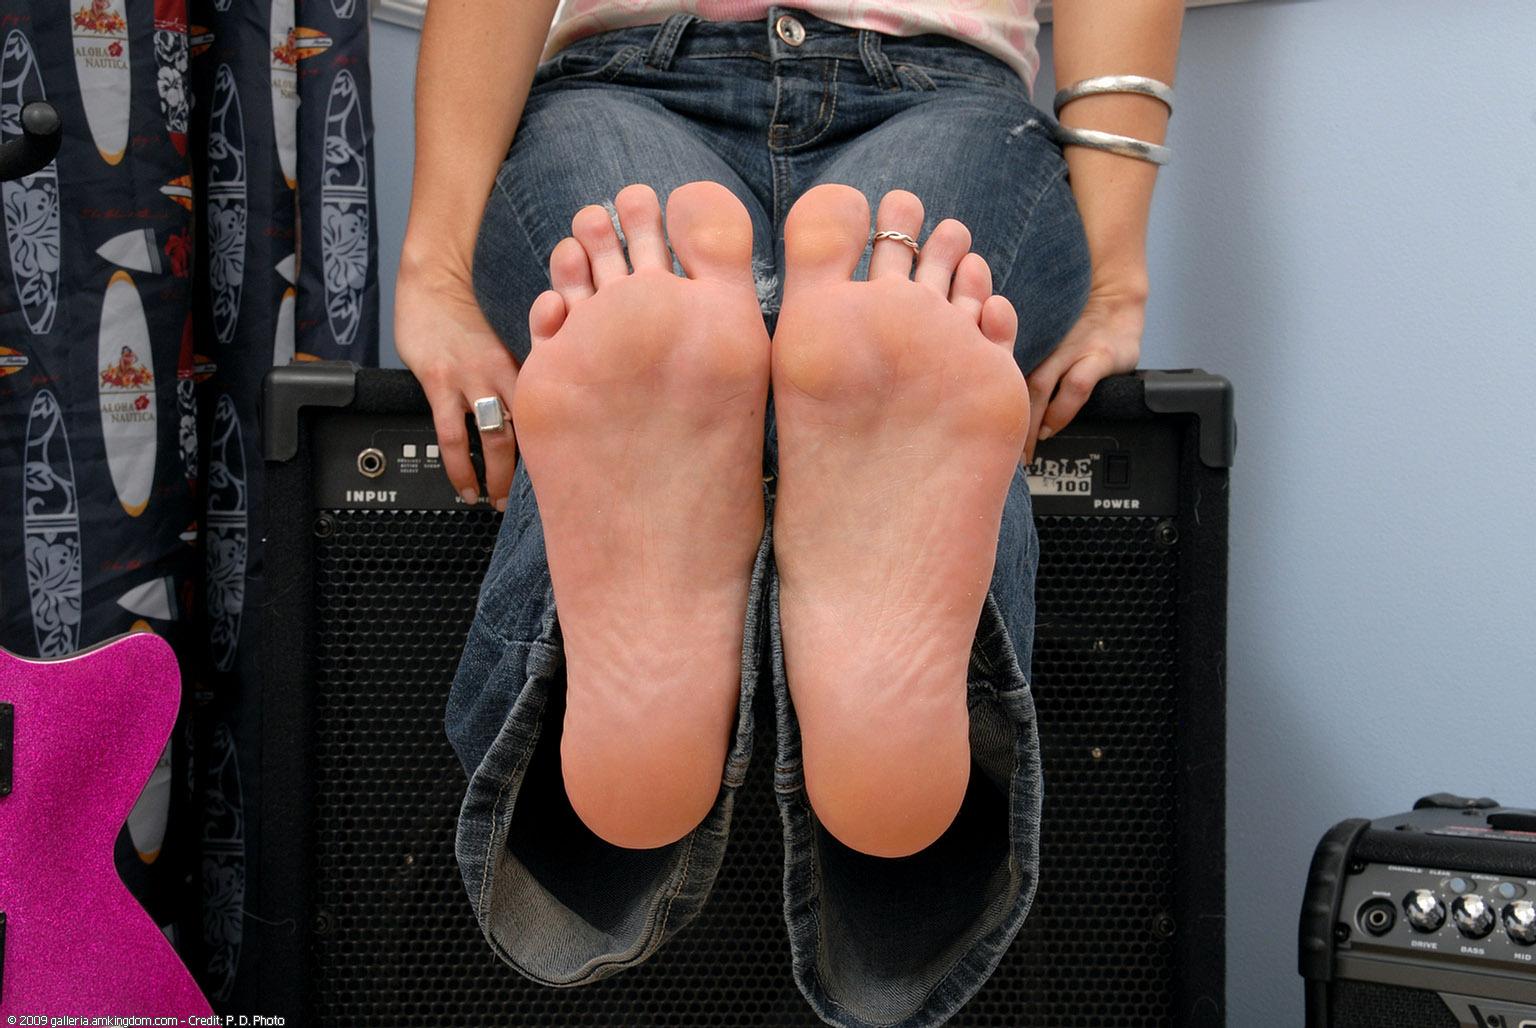 Jasmyn Jolie's Feet